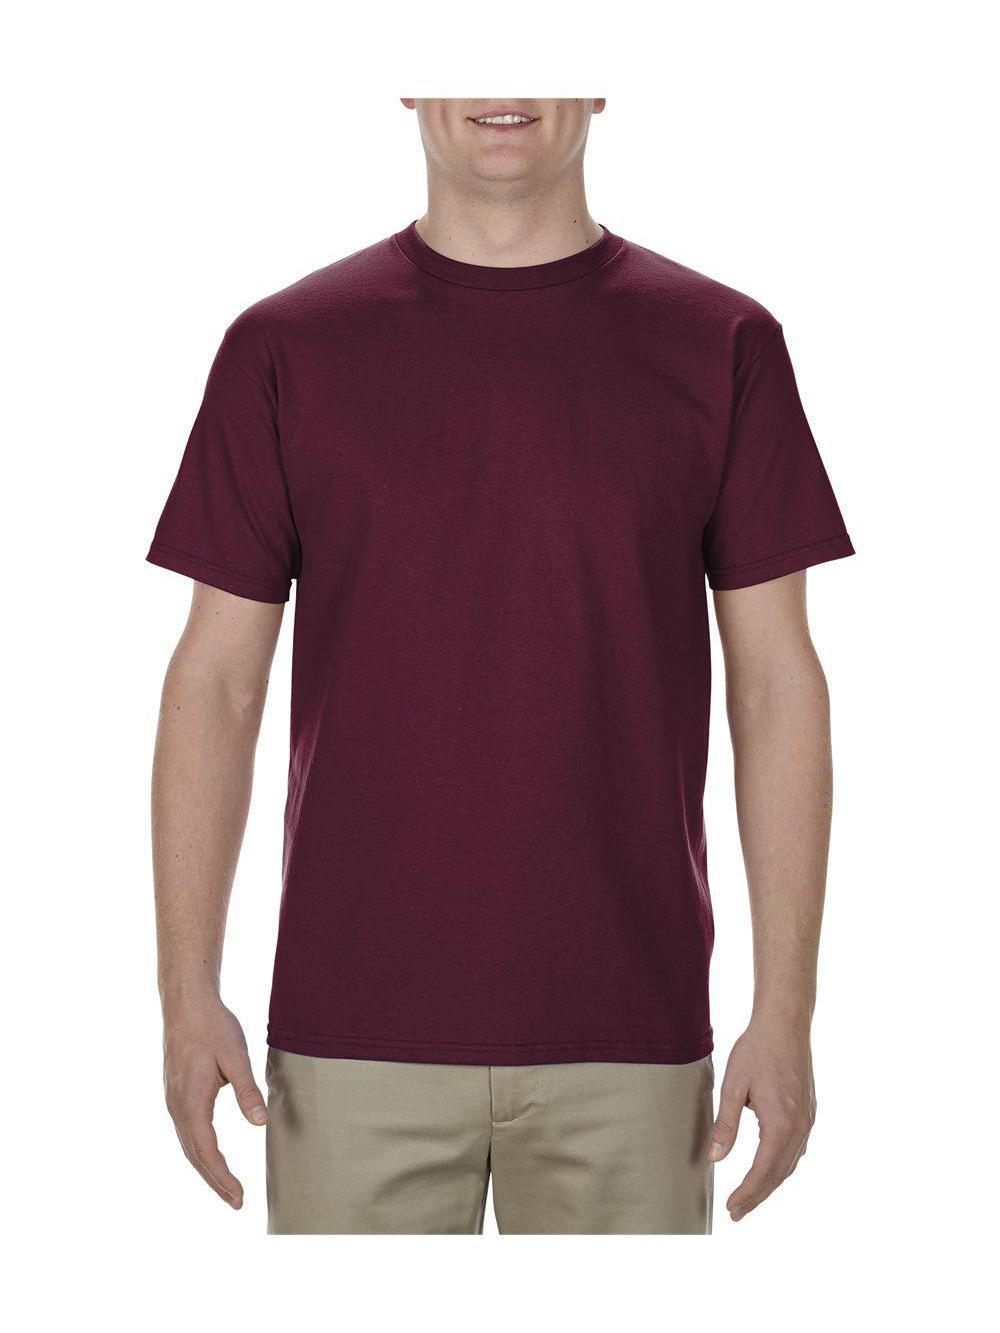 ALSTYLE-Premium-T-Shirt-1701 thumbnail 12